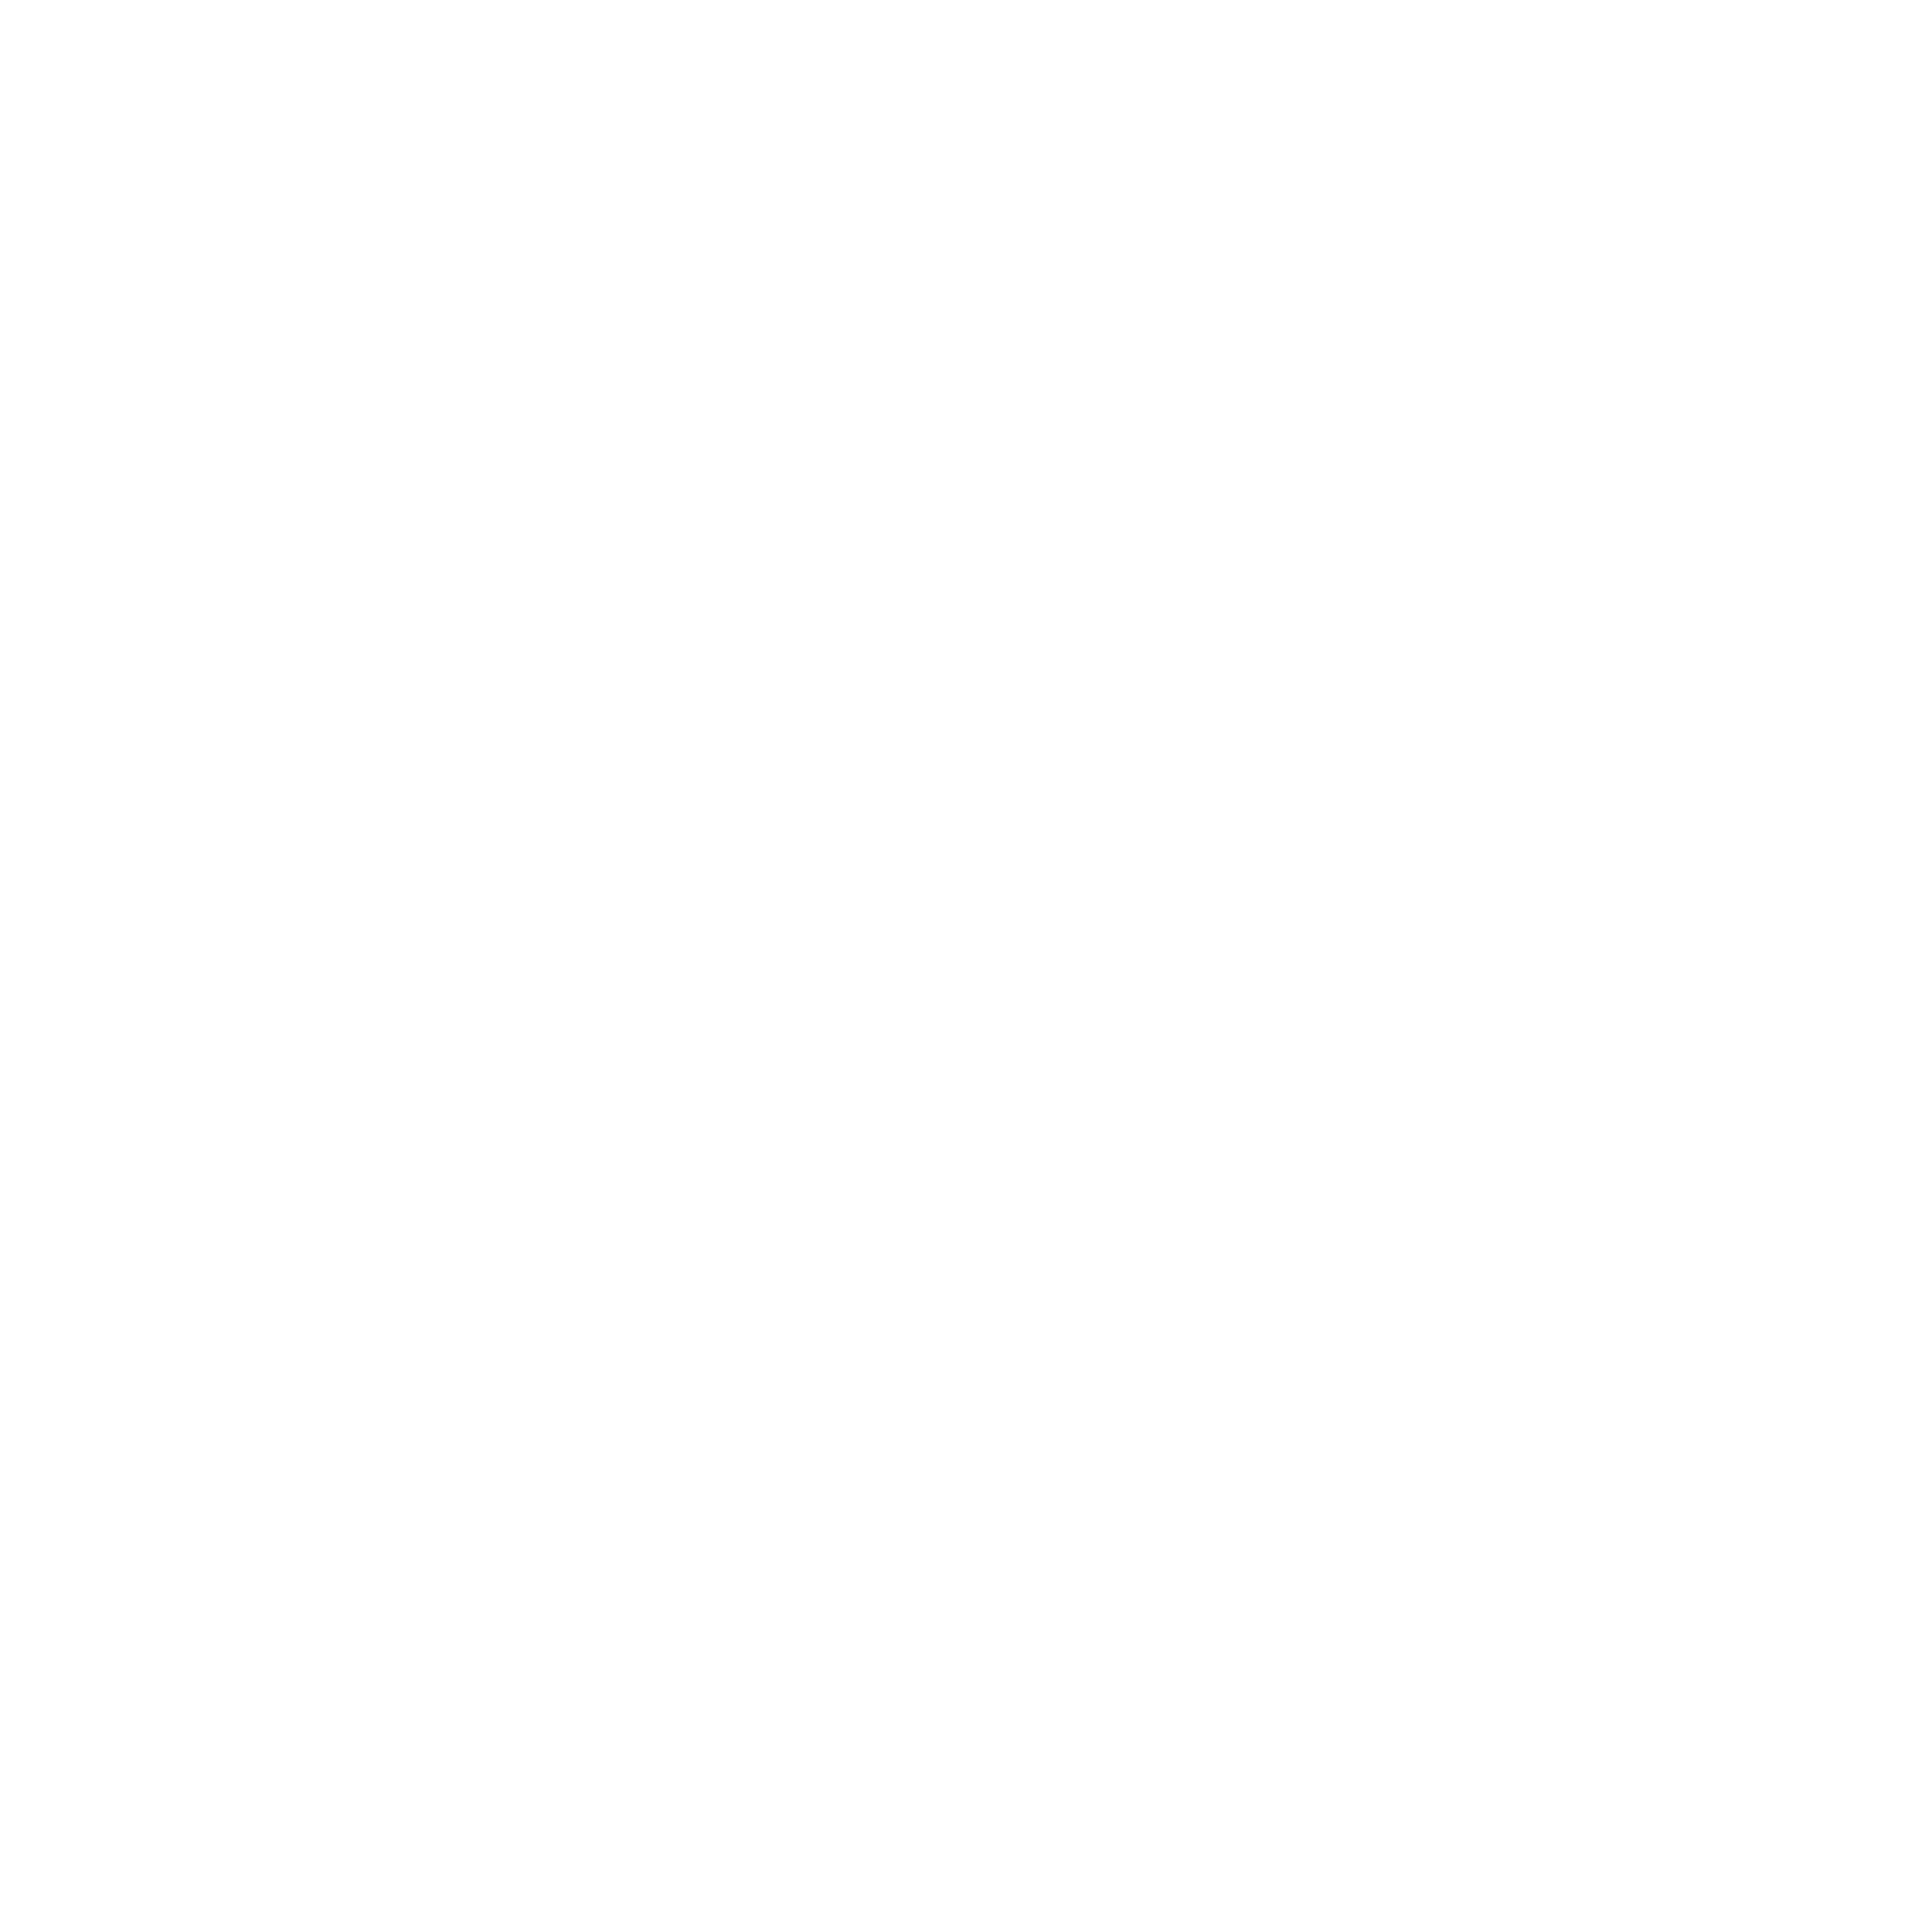 Assassin S Creed Unity Logo By Fast Cursor On Deviantart